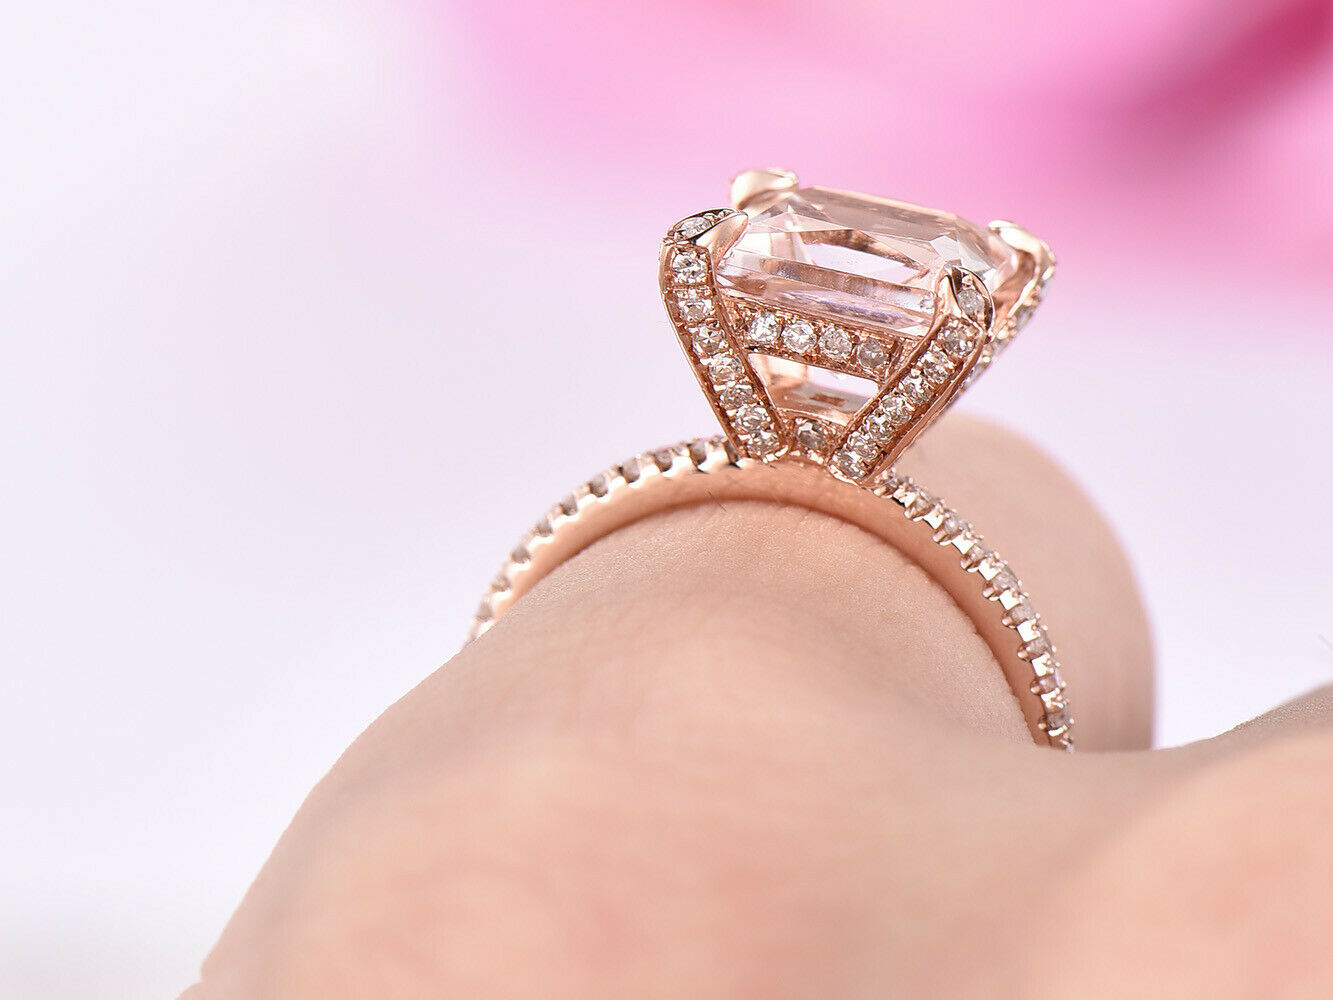 14K White gold 8mm Princess Morganite Engagement Wedding Diamond Ring 4 Prongs